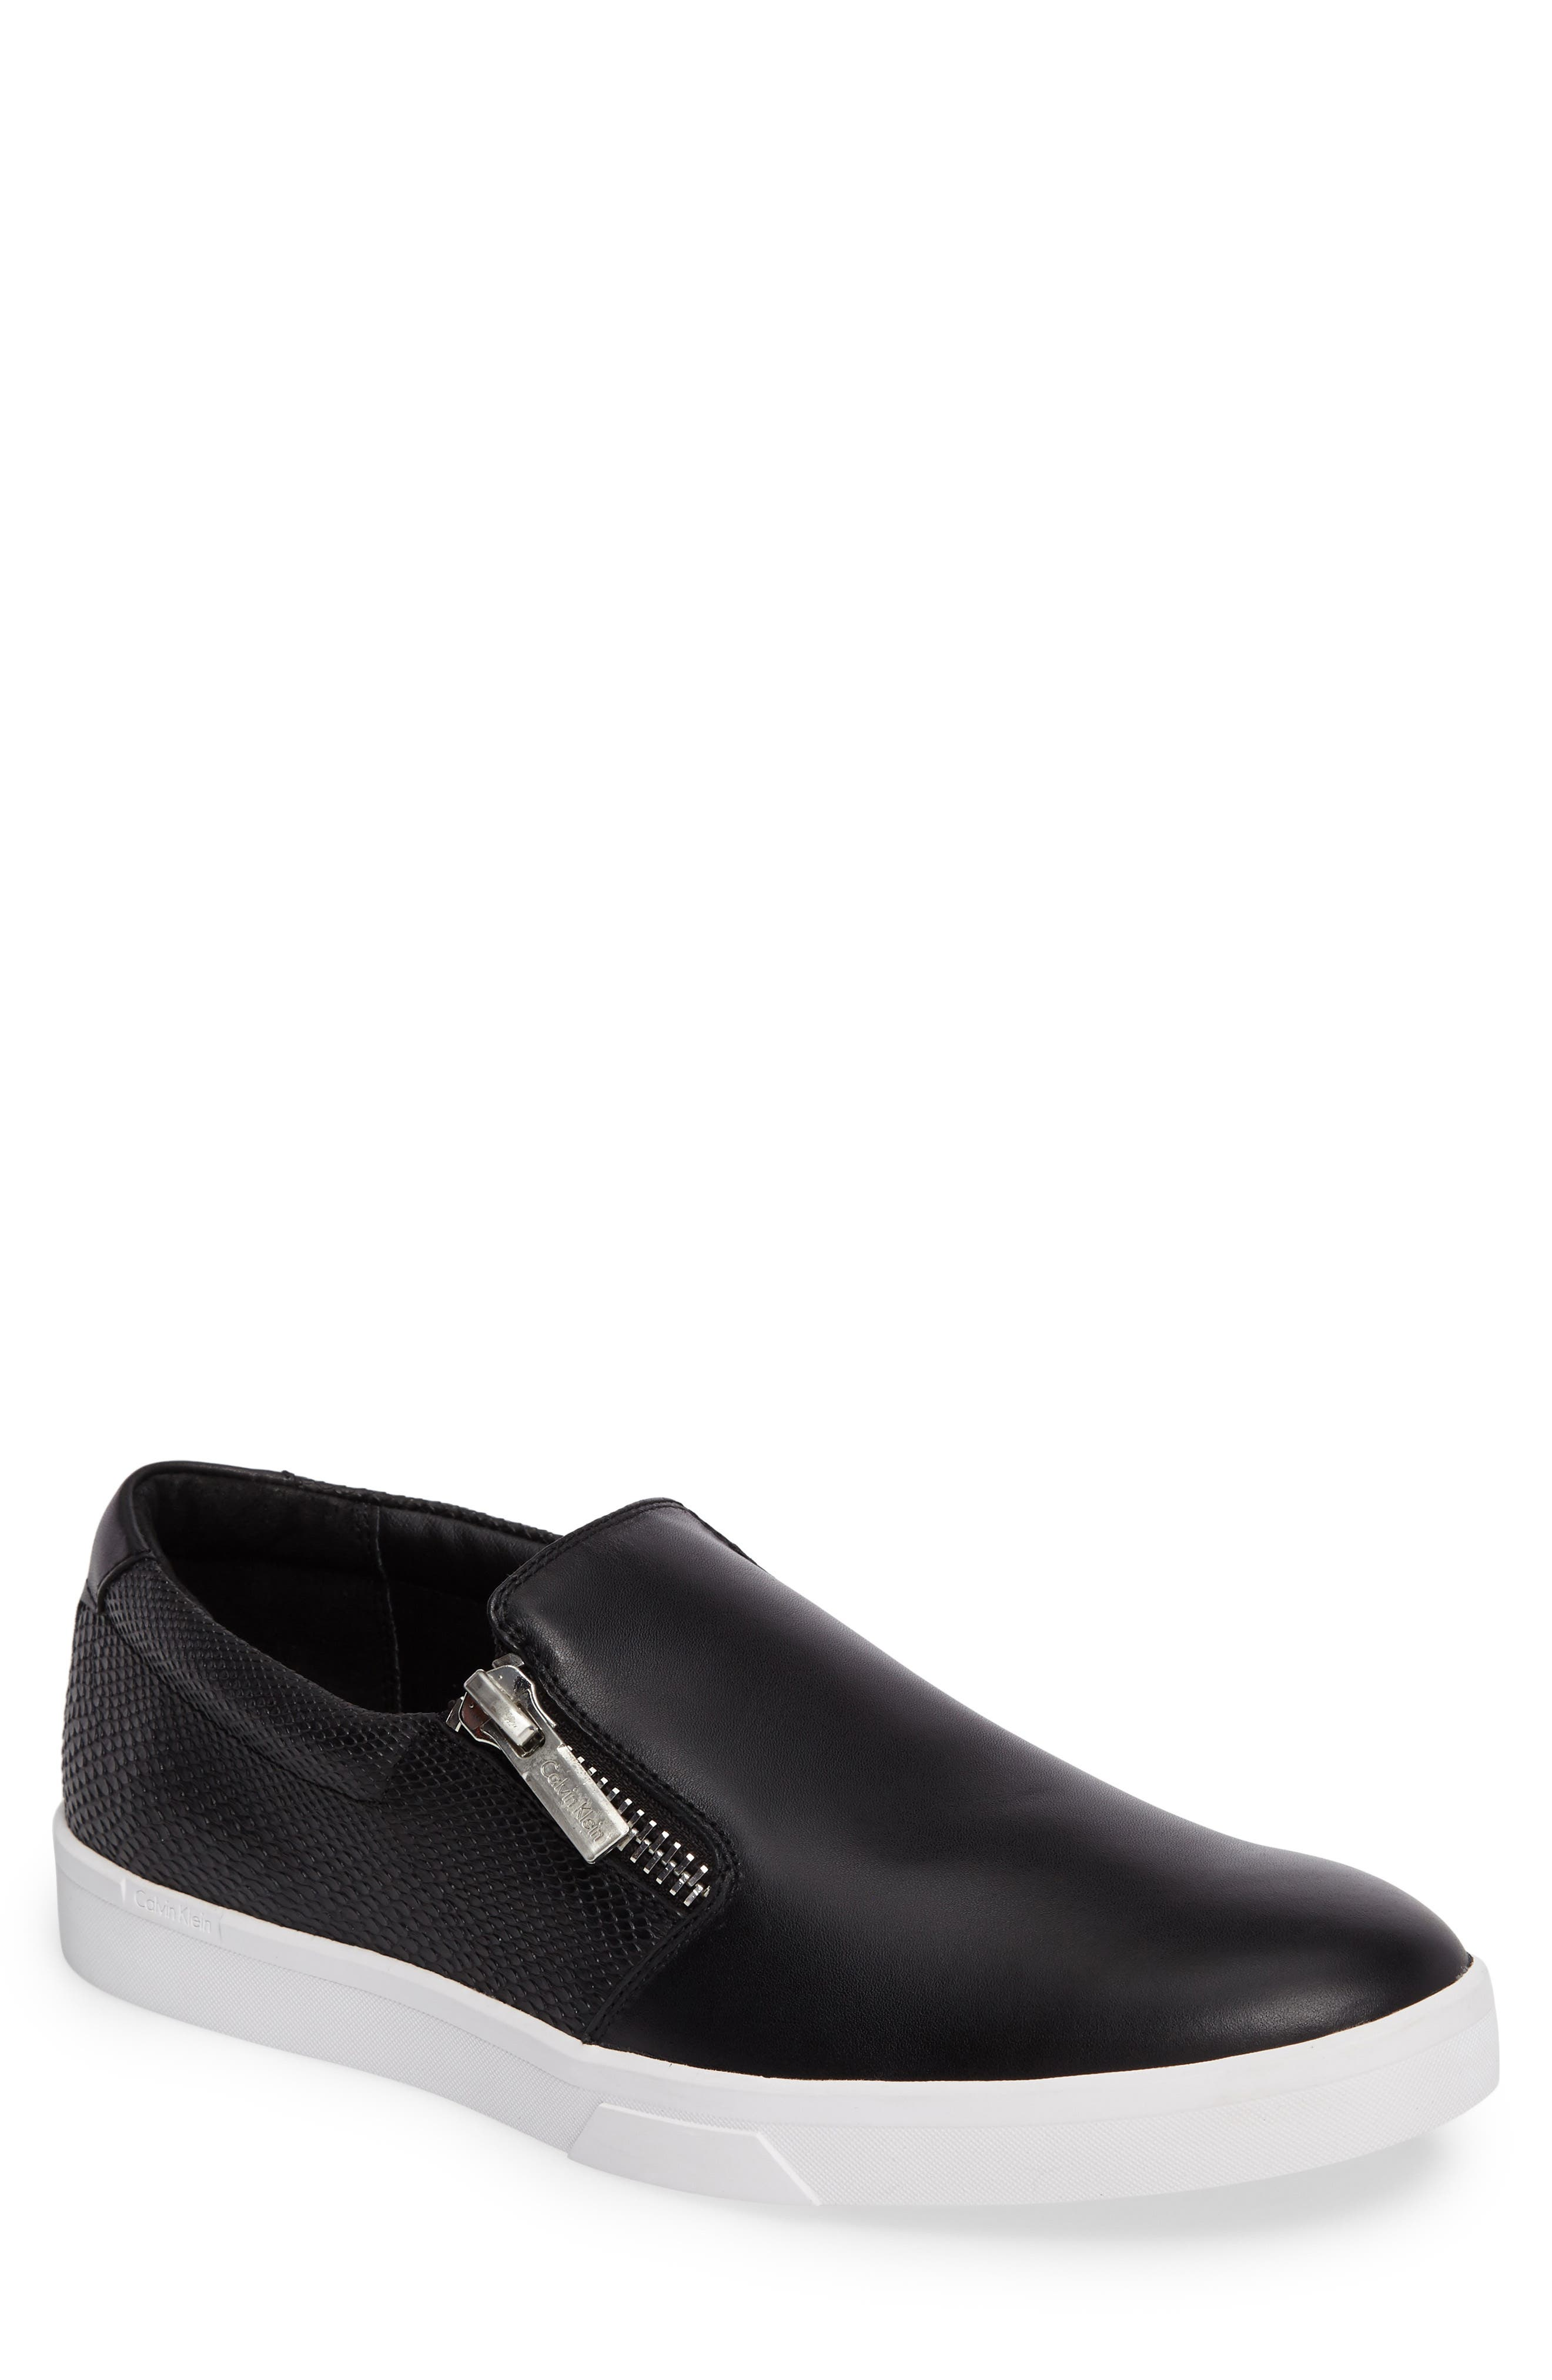 Ibiza Slip-On Zip Sneaker,                         Main,                         color, 001